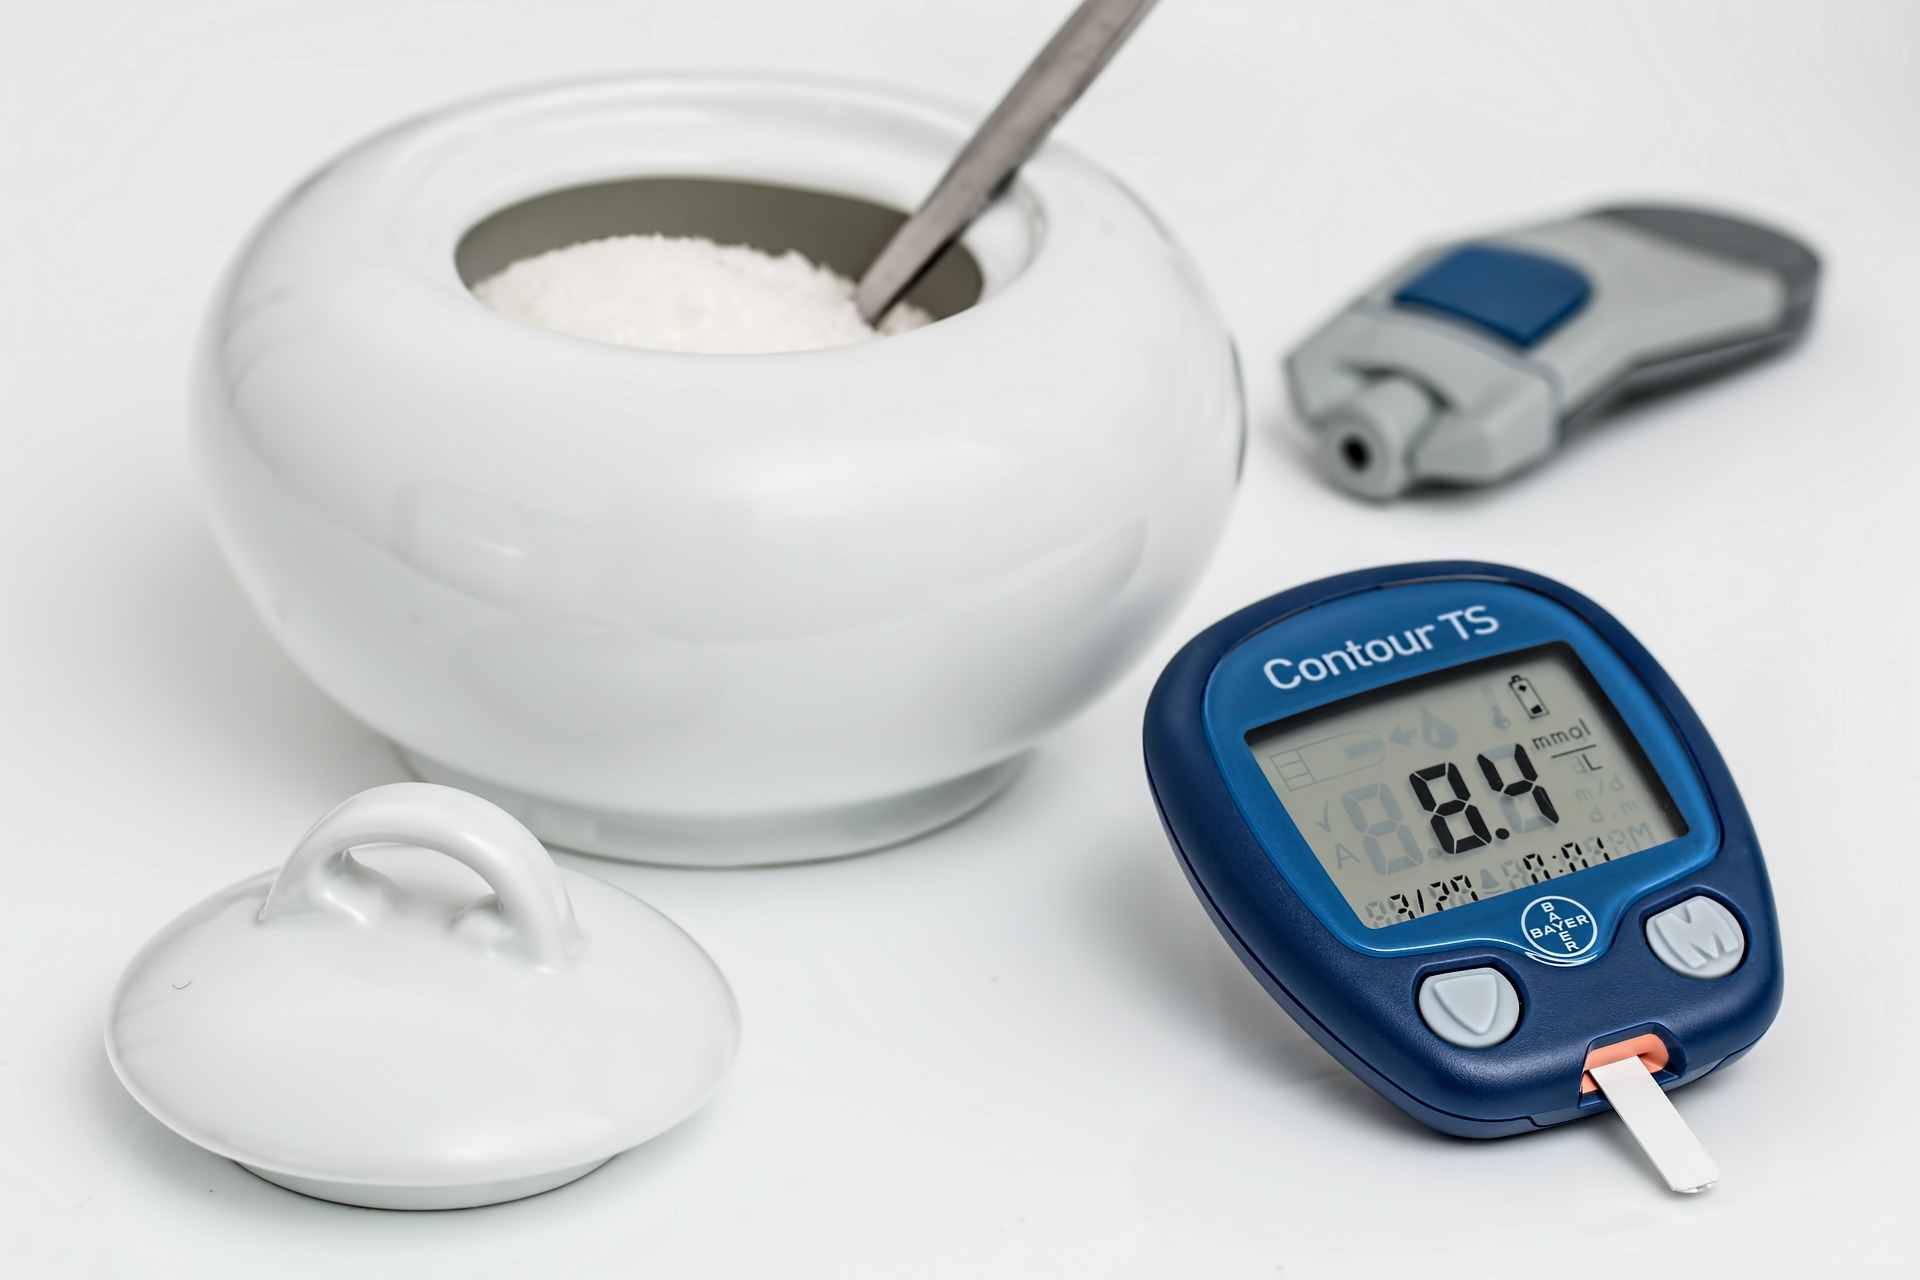 Tilsat sukker kan medvirke til diabetes og fedtlever